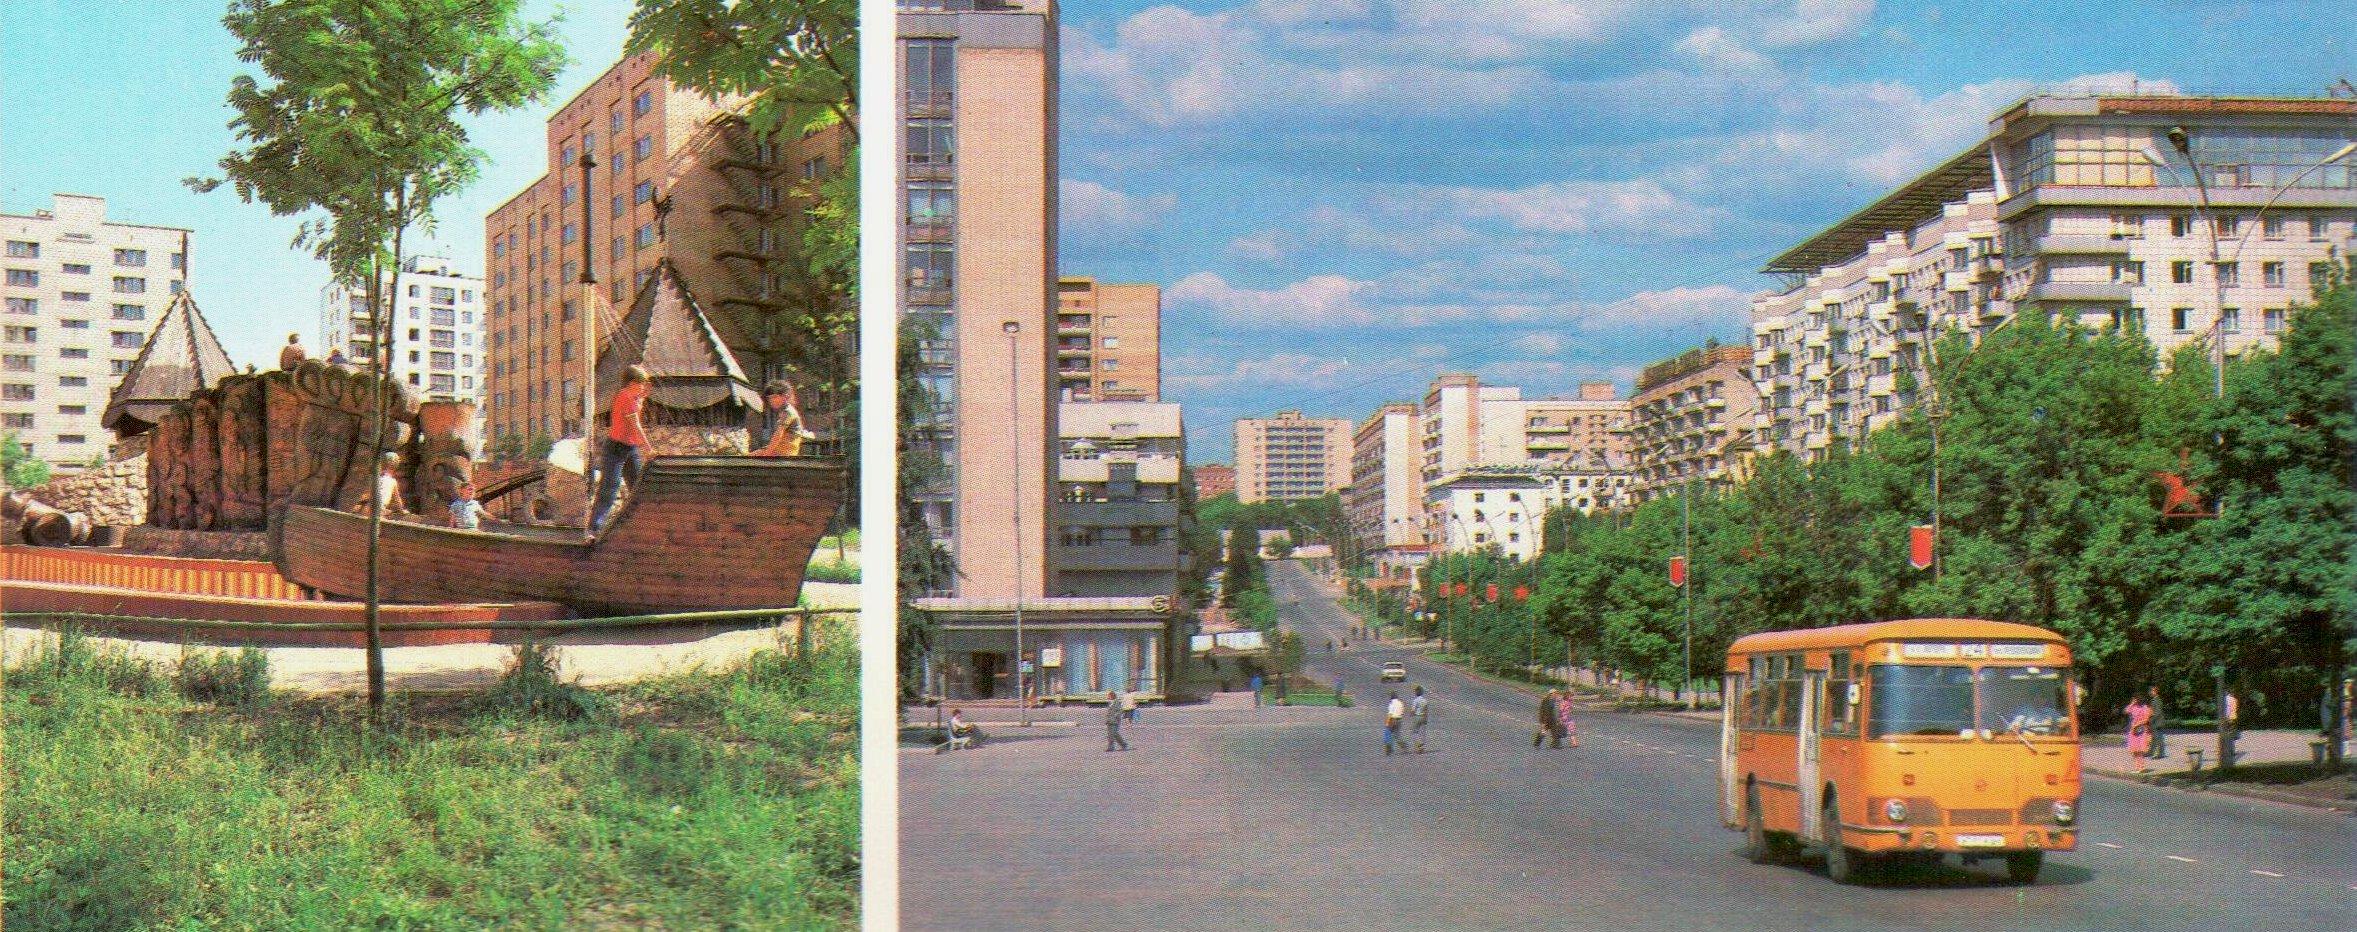 Улица Молодогвардейская